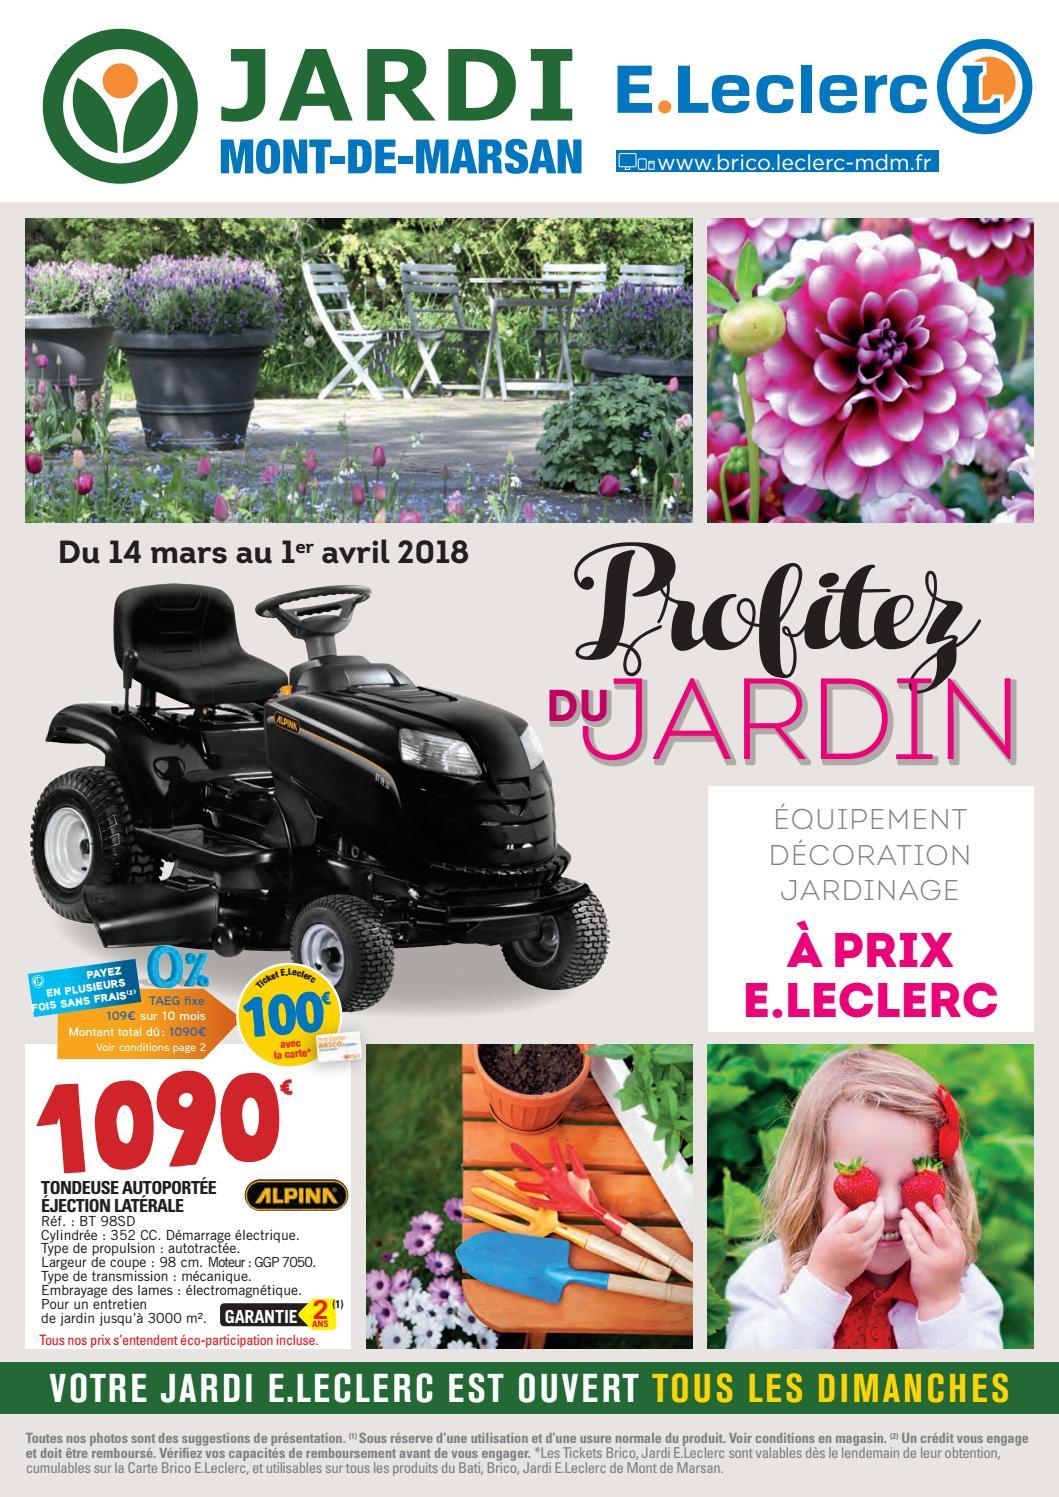 Catalogue Jardin - Jardi E.leclerc By Chou Magazine - Issuu destiné Serre Leclerc